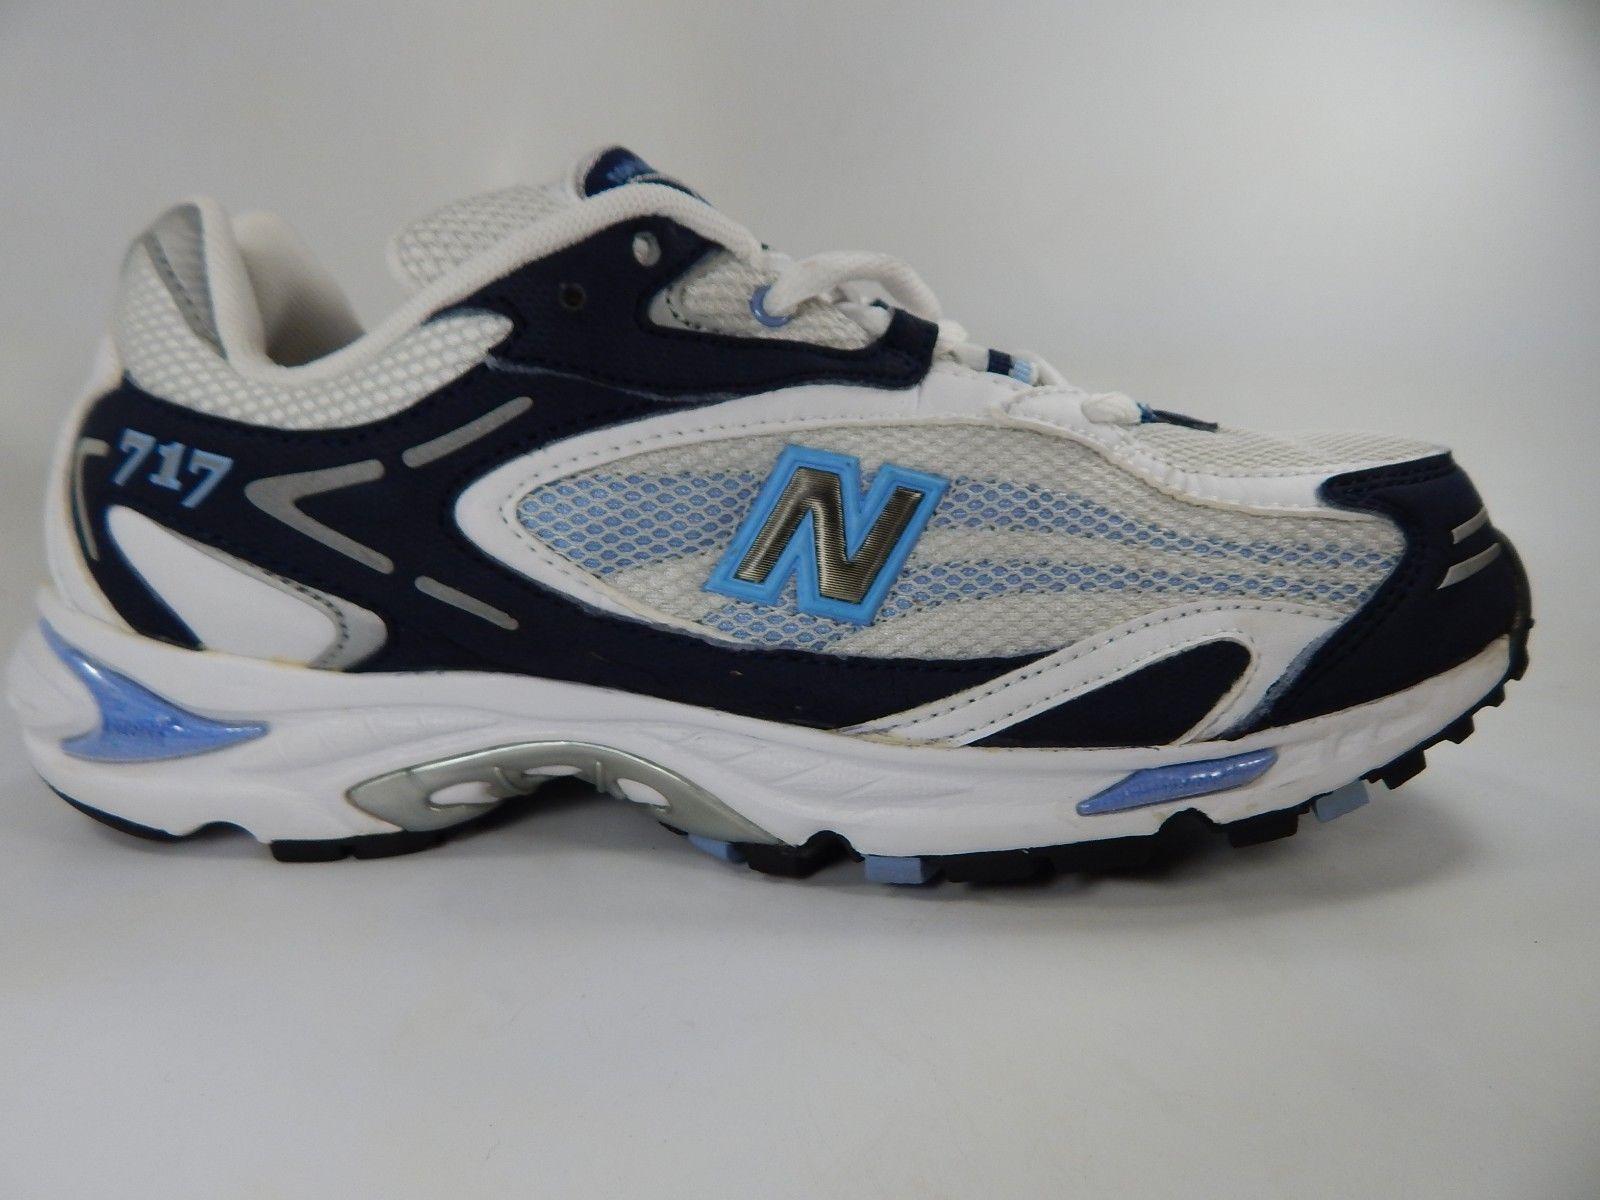 New Balance 717 Size 9.5 M (B) EU 41.5 Women's Running Shoes White Blue W717NB